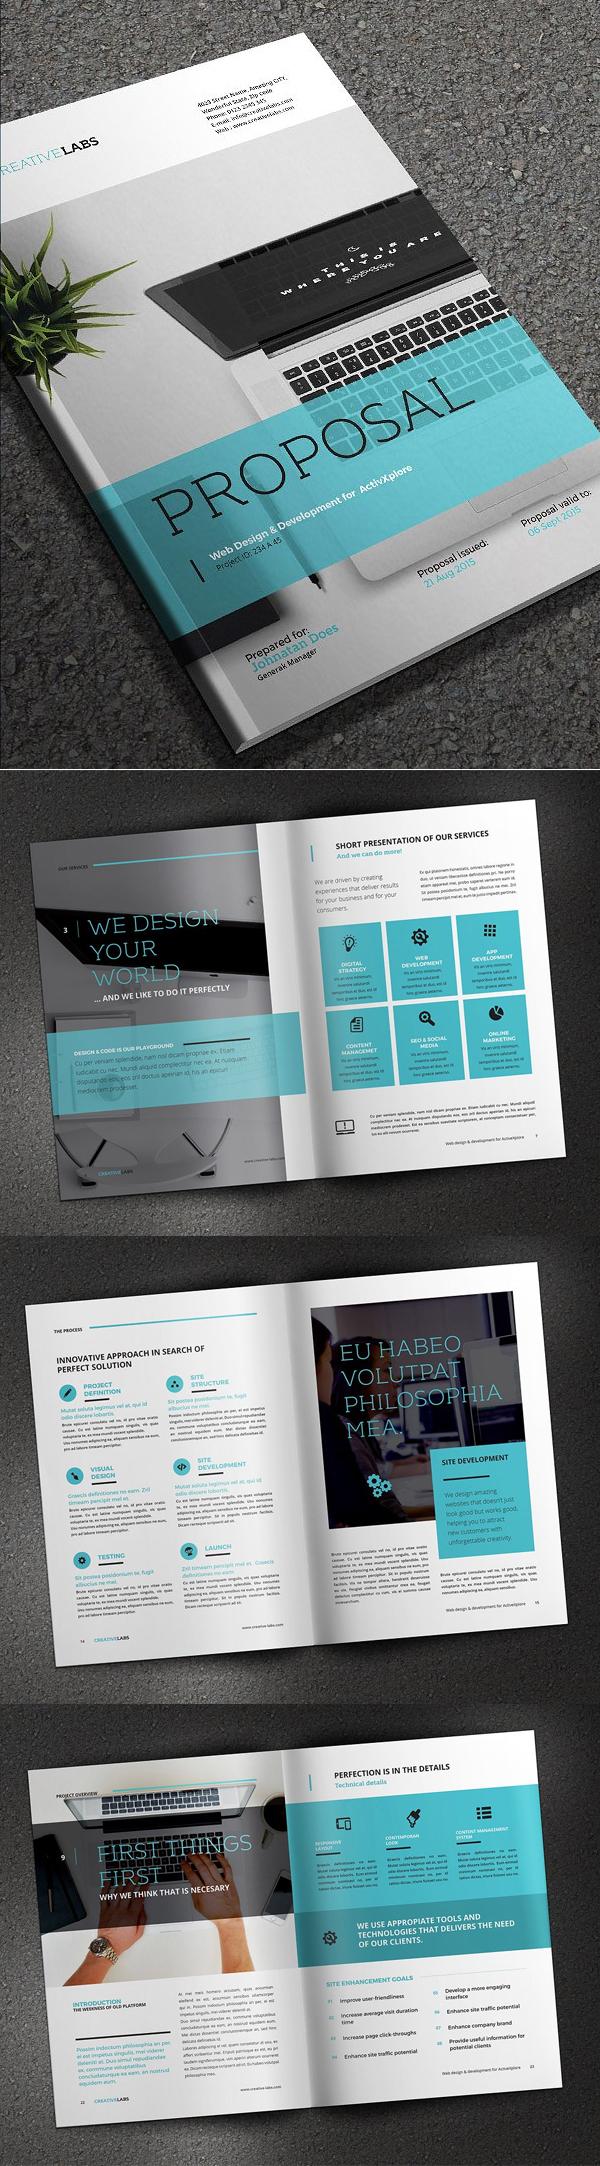 100 Professional Corporate Brochure Templates - 84